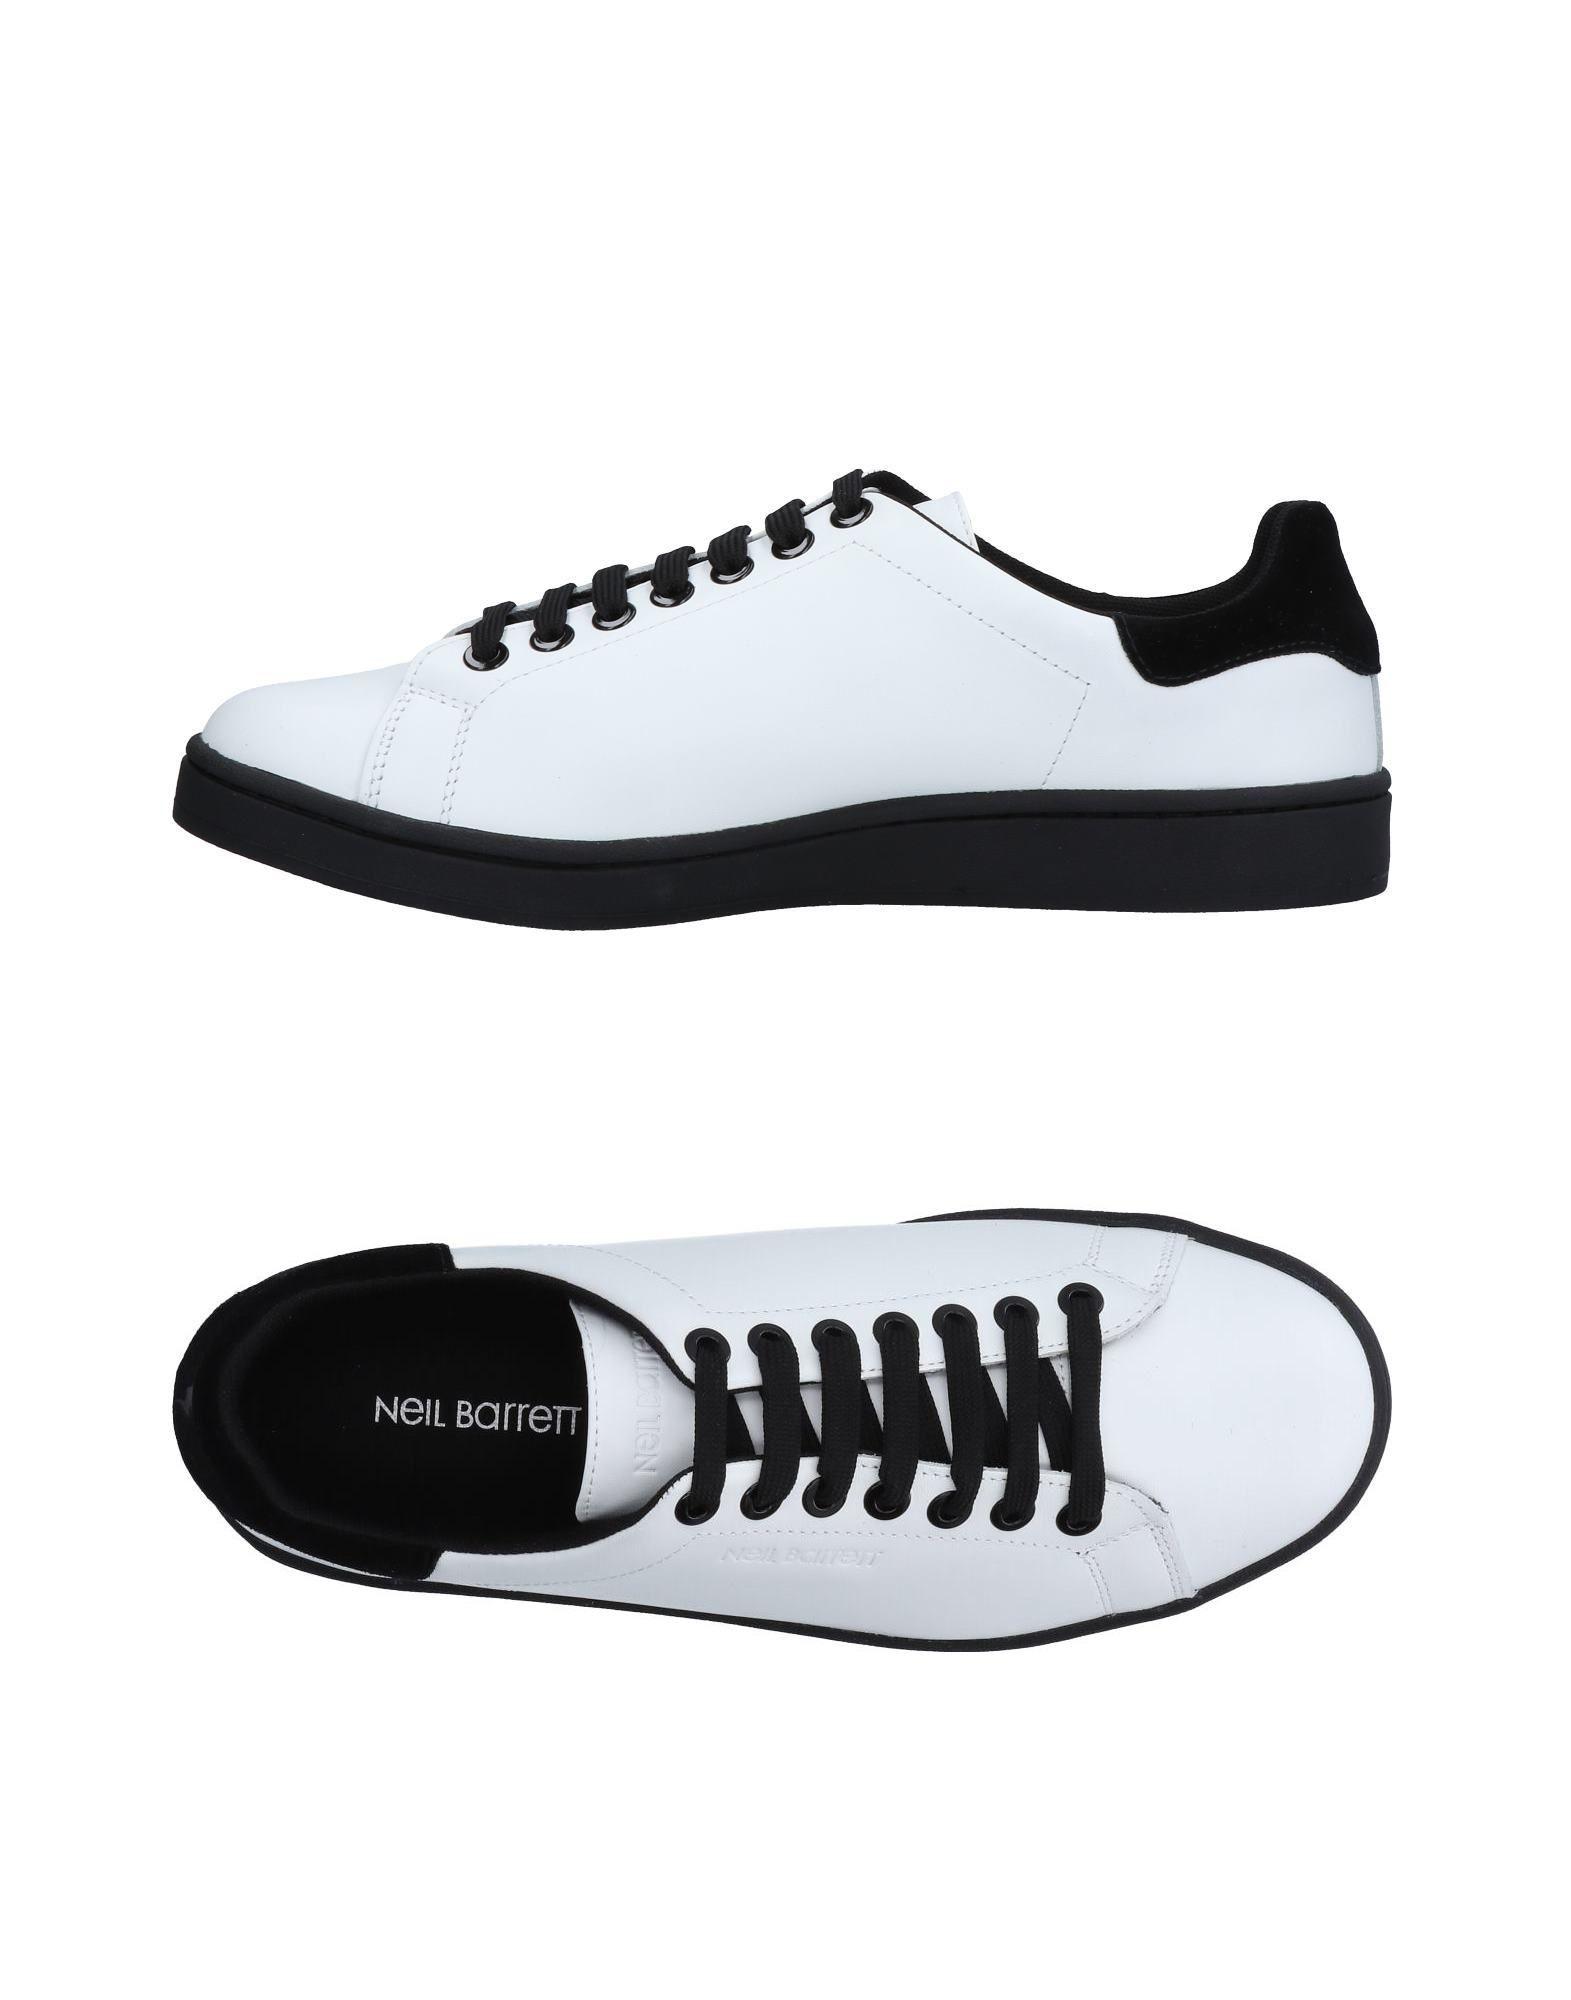 Neil Barrett Sneakers Herren  11522689WK Gute Qualität beliebte Schuhe